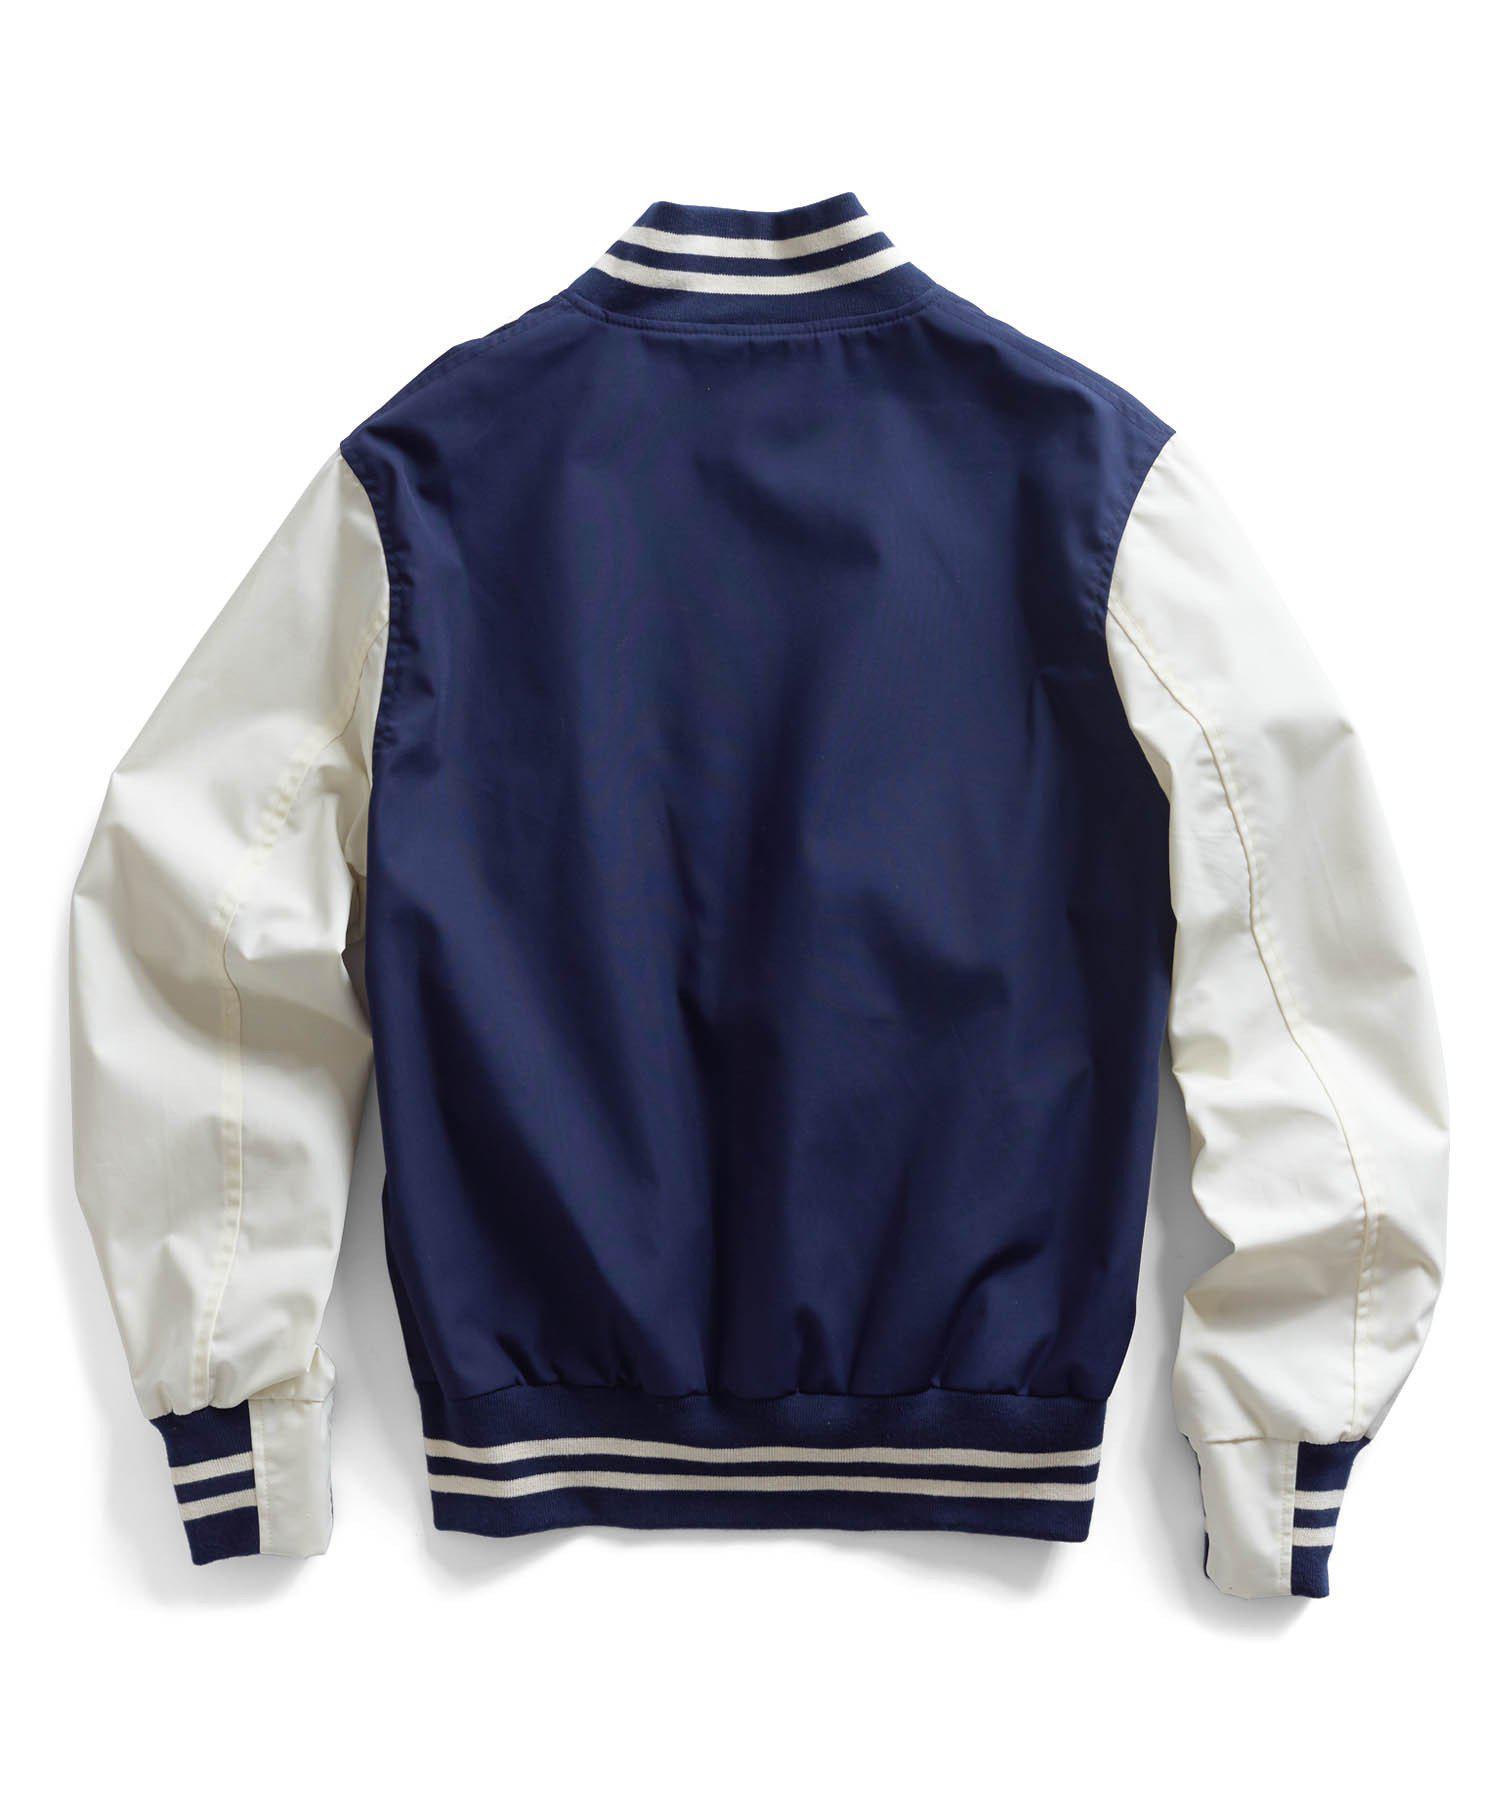 Todd Synder X Champion Navy Varsity Jacket in Blue for Men